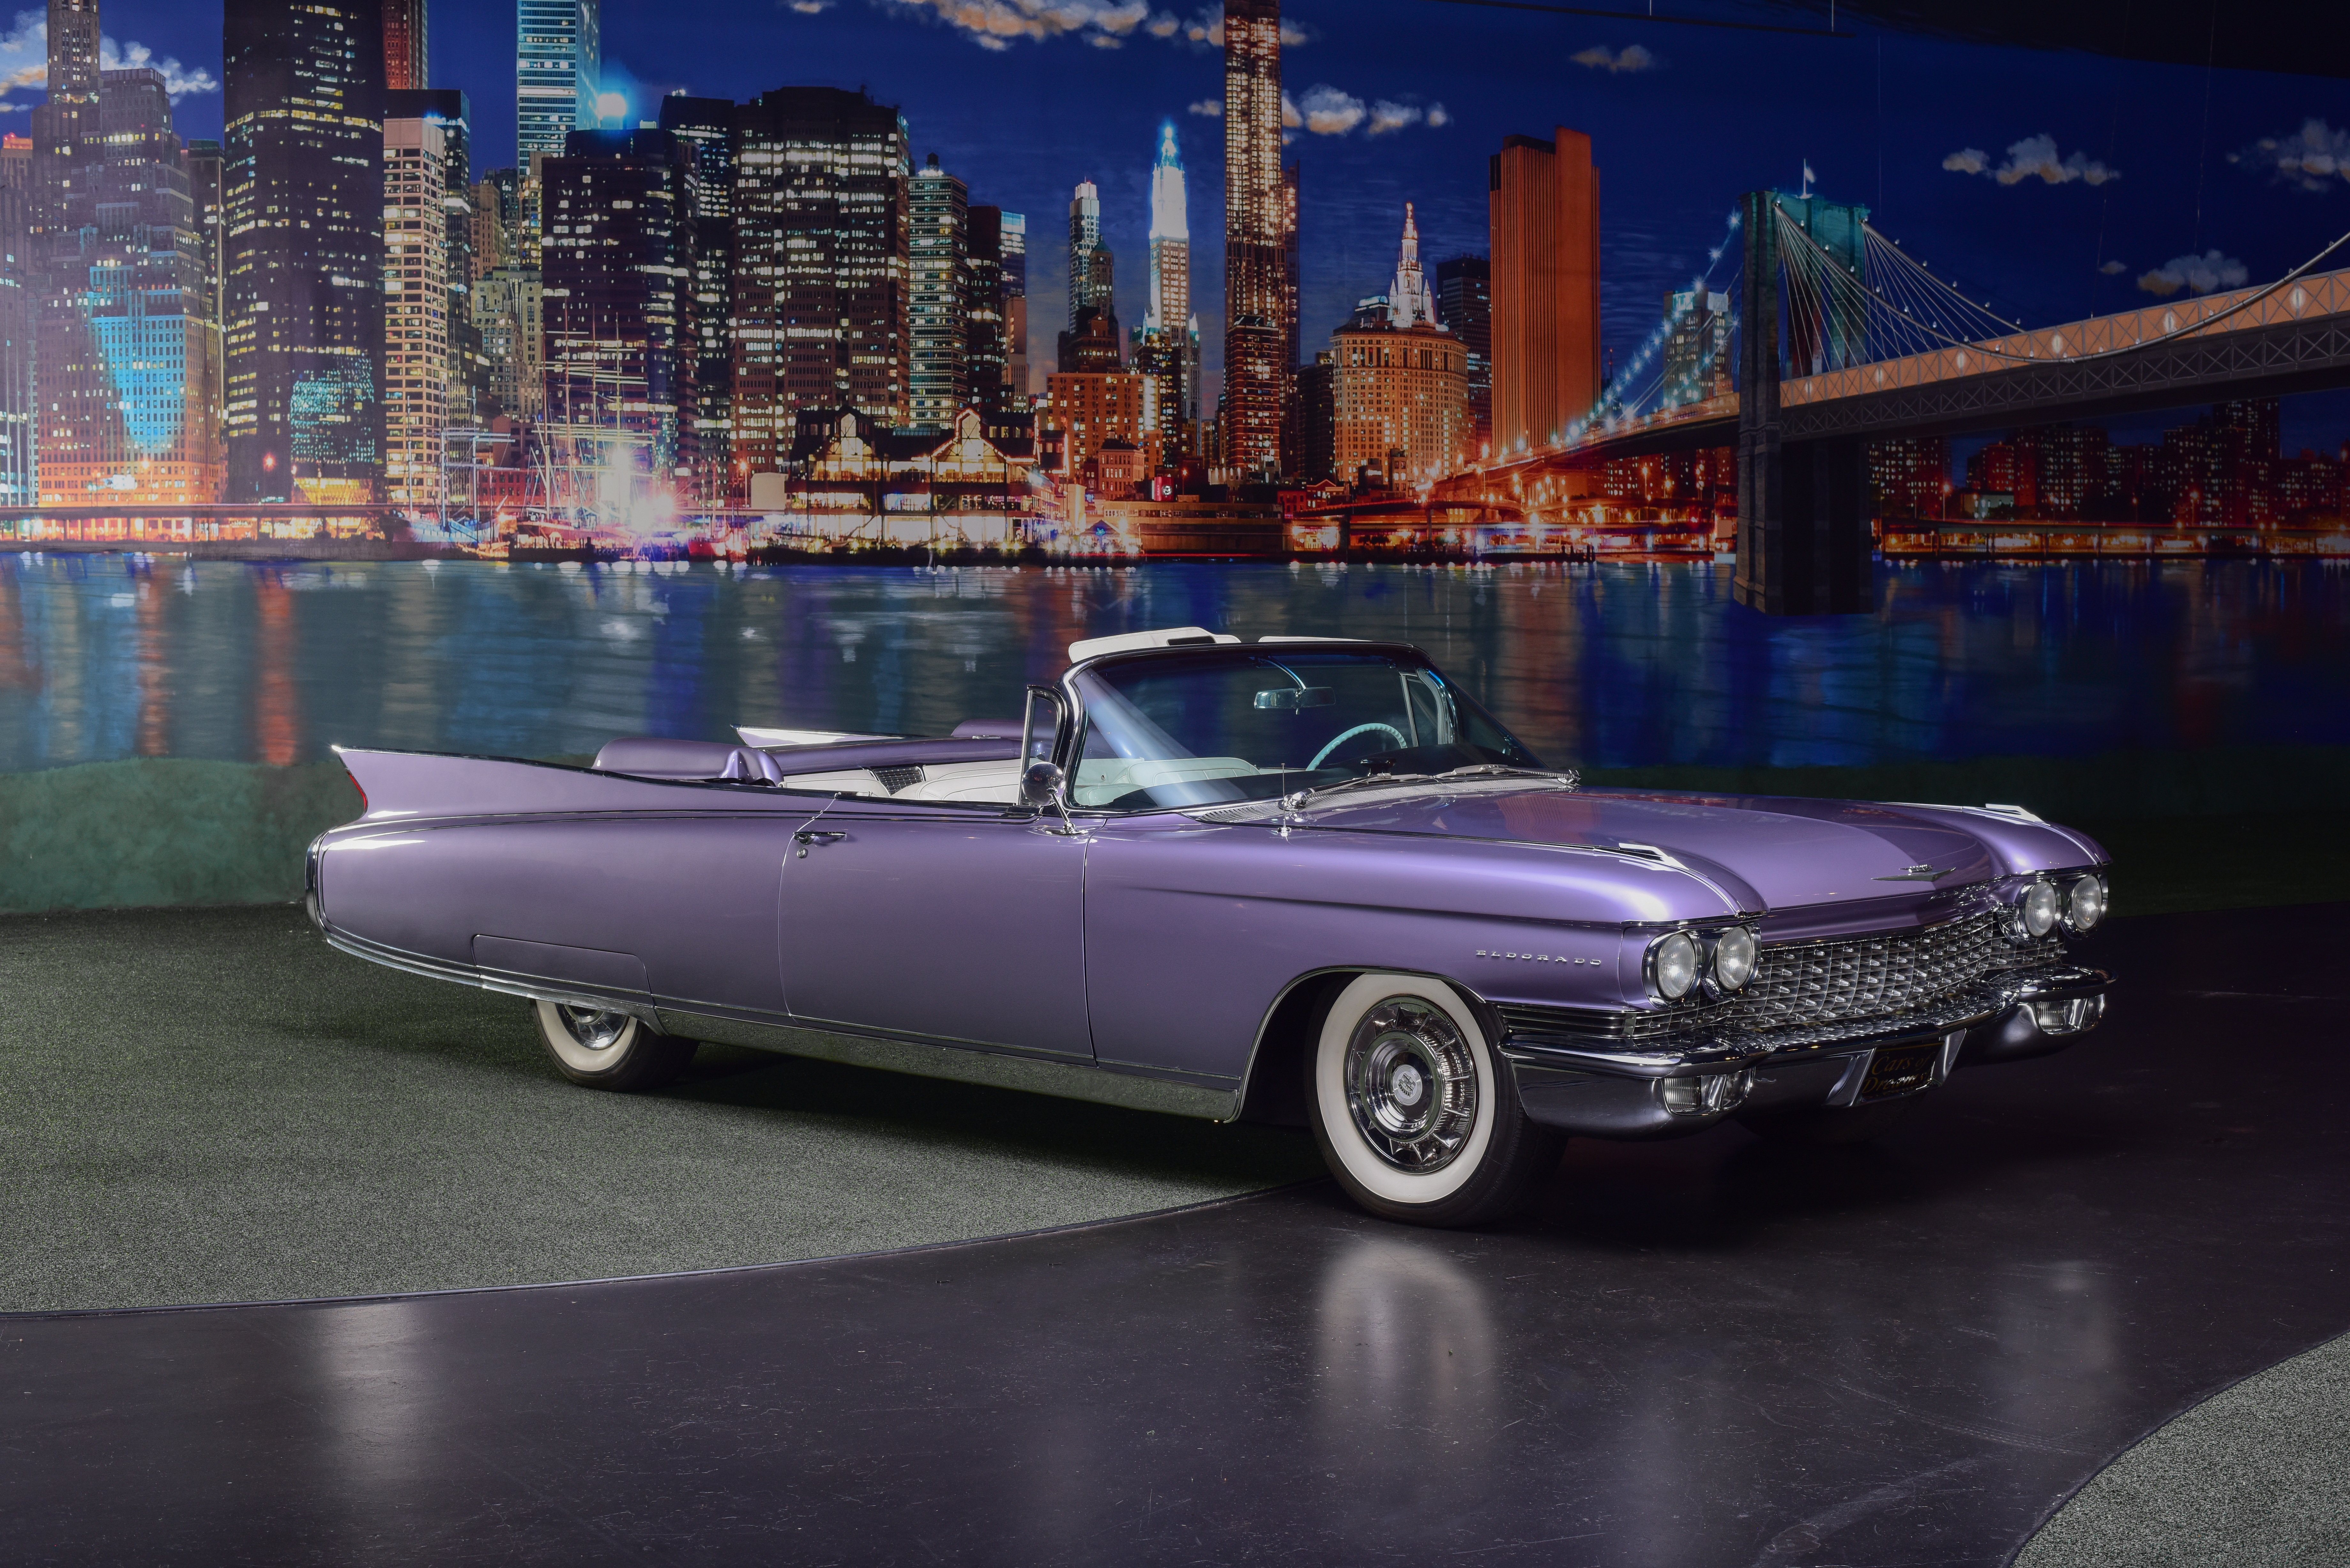 Barrett-Jackson Palm Beach offering shows beautifully restored classic 1960 purple Cadillac Eldorado Biarritz Convertible with whitewalls